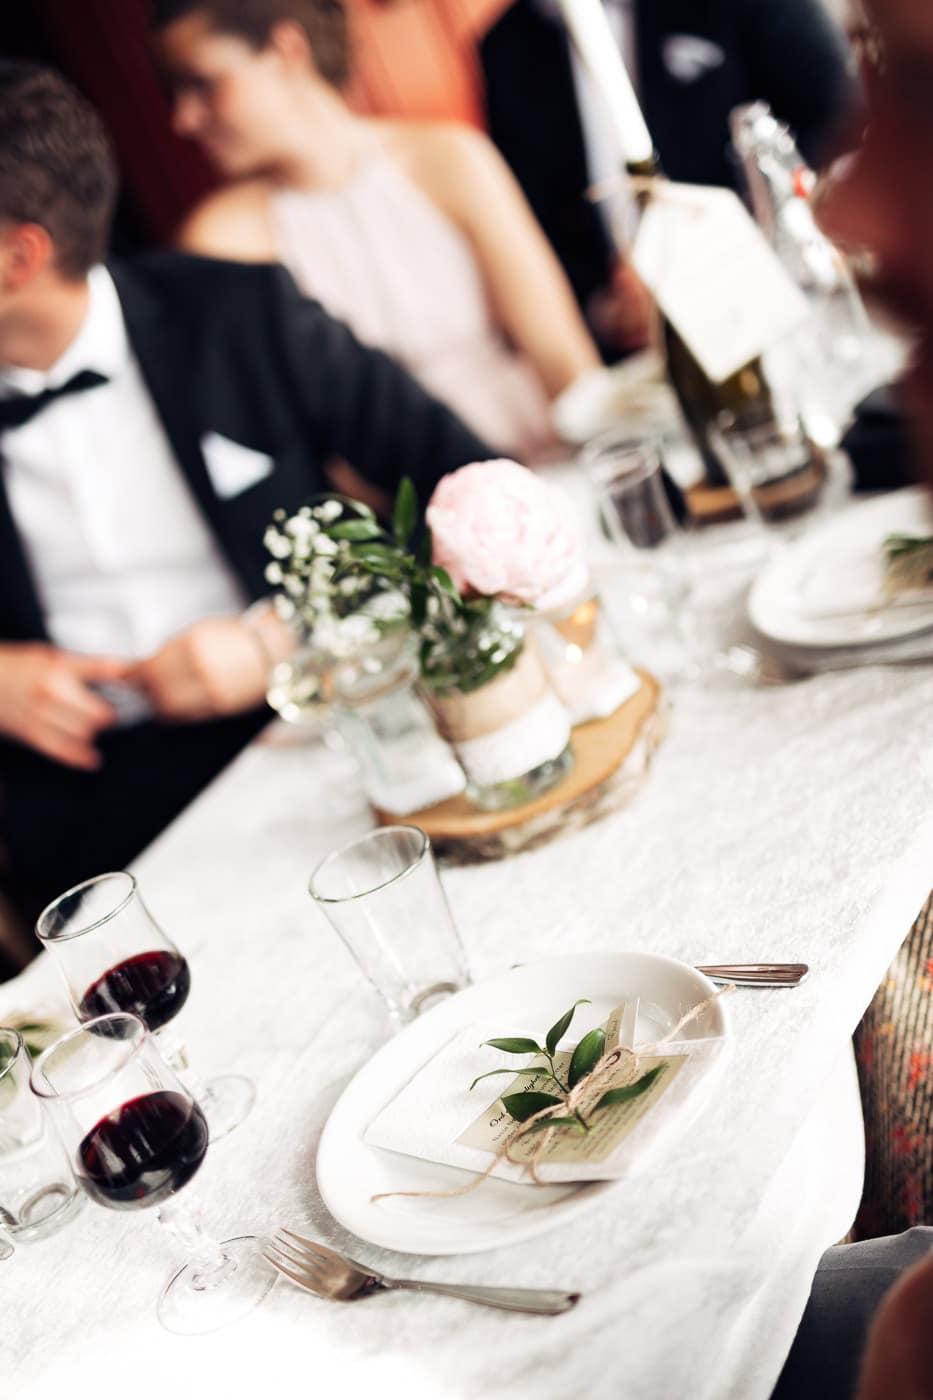 Karoline & Andreas - bryllup i Østfold med magiske detaljer Bryllup Fredrikstad Fotograf 61